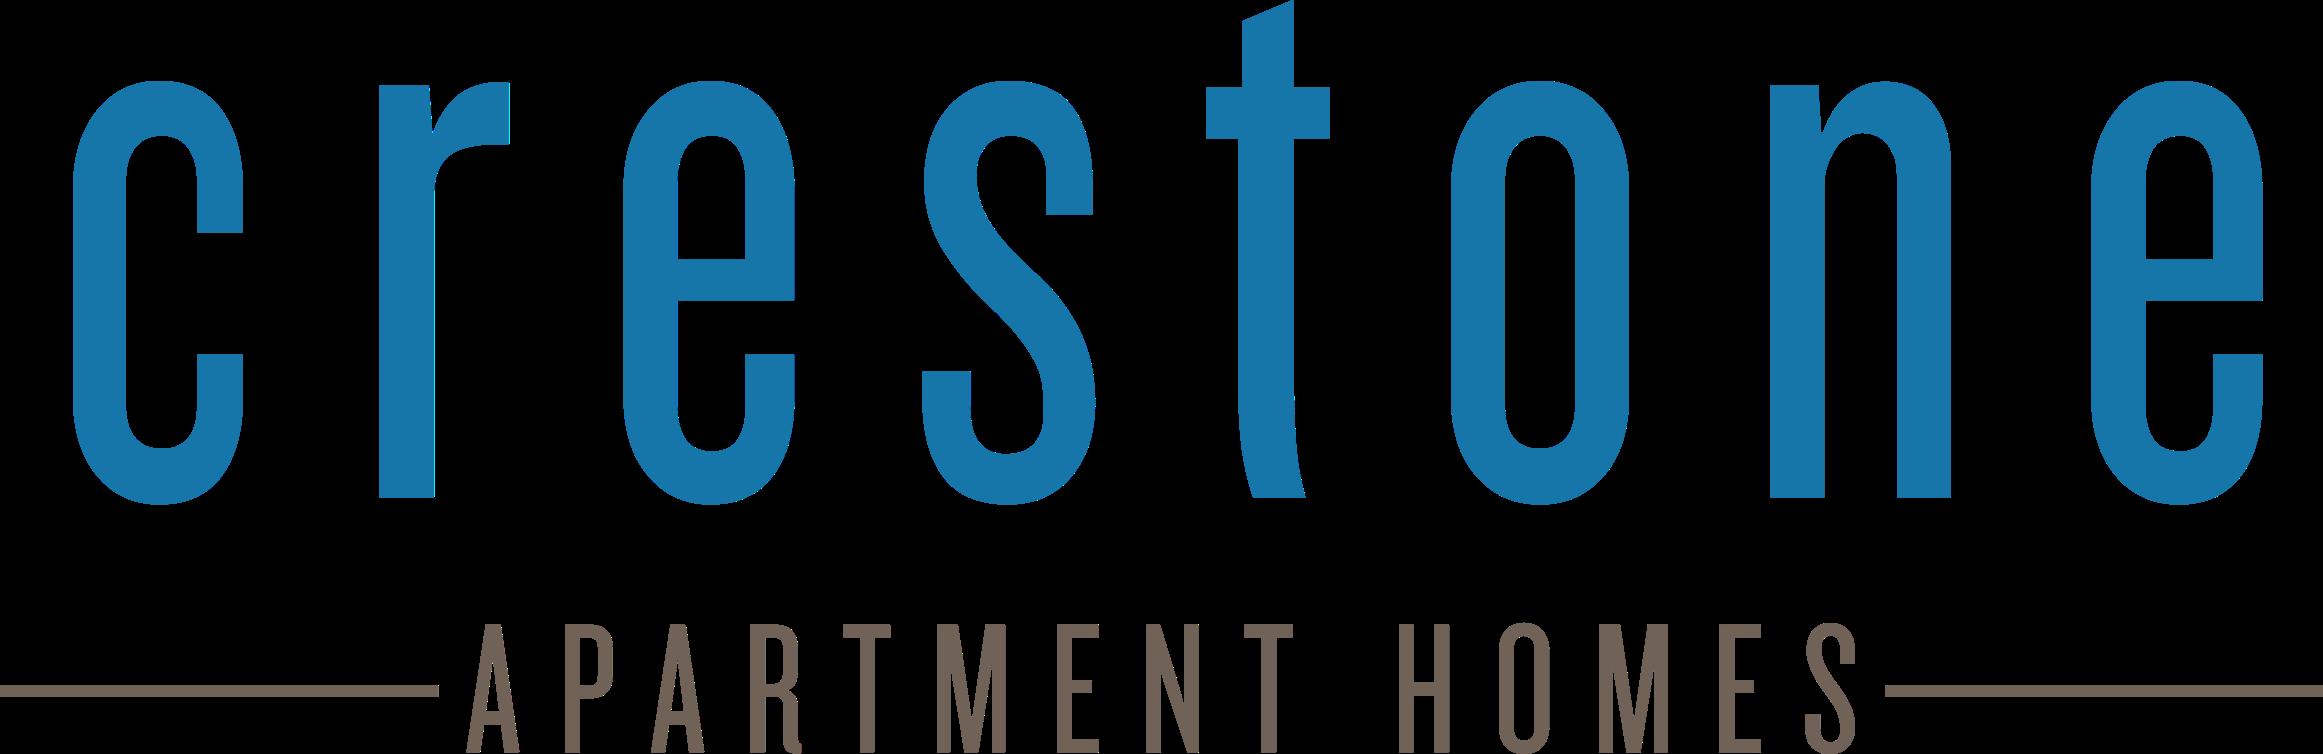 Crestone Apartment Homes Crestone Apartments Logo